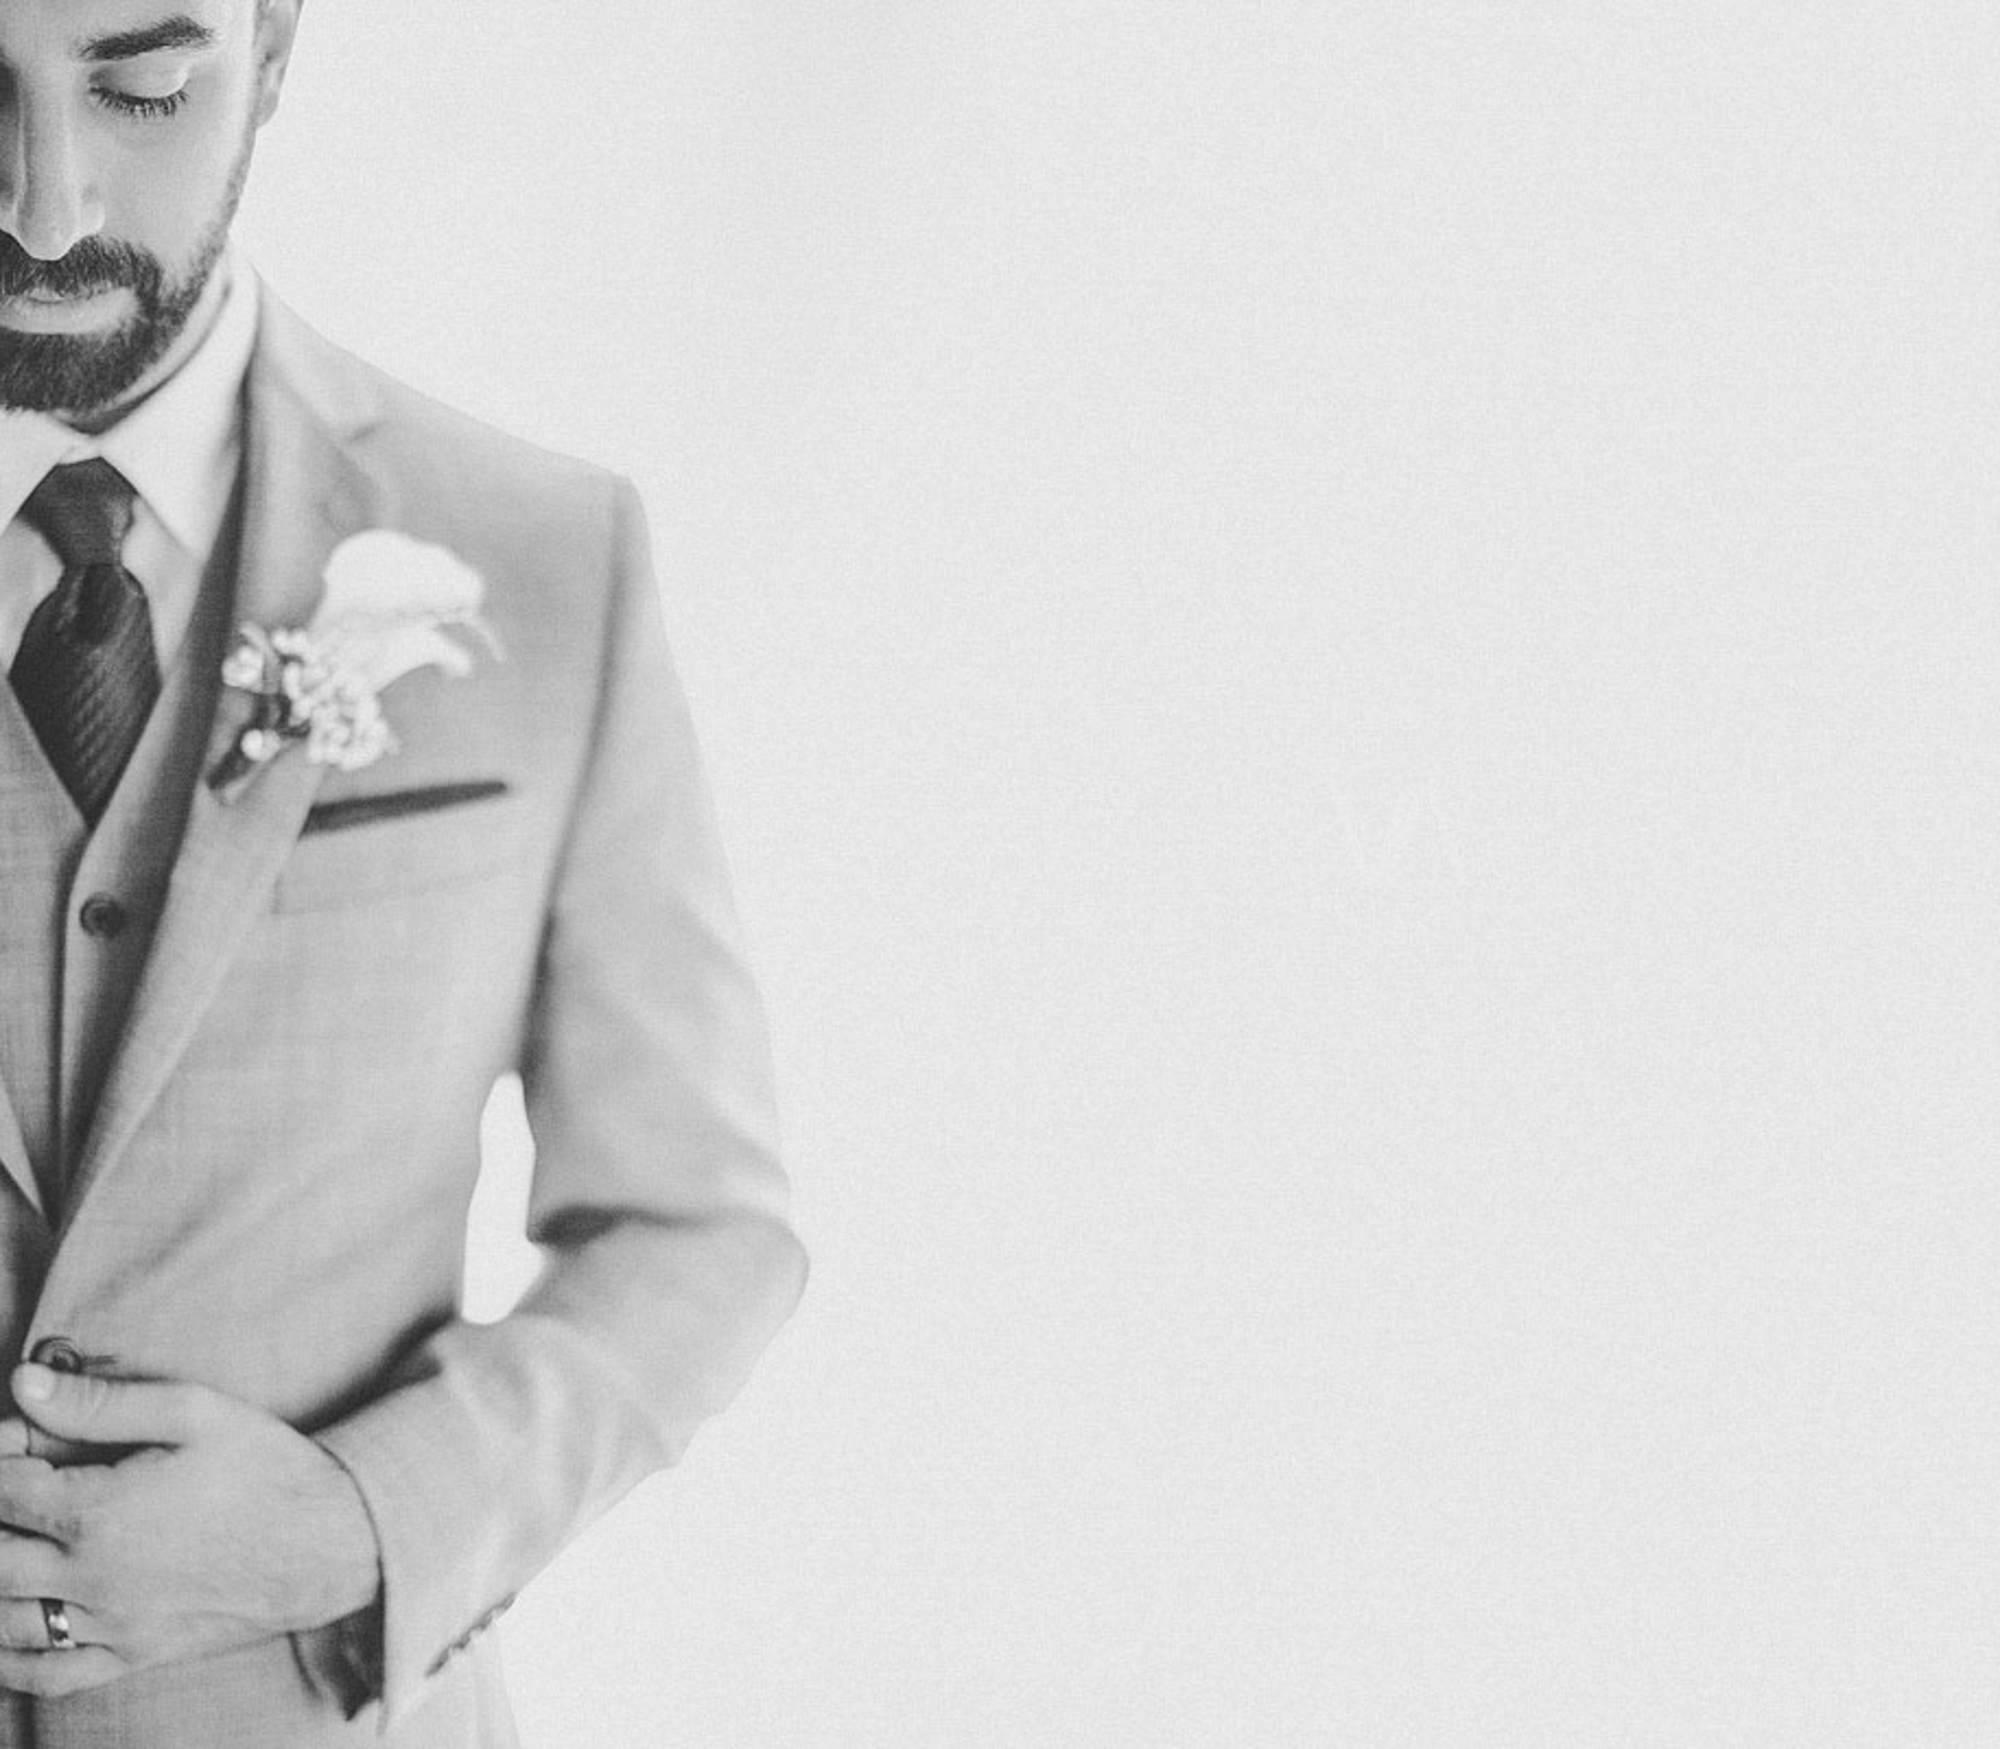 Creative black and white half portrait of groom, by Jeff Newsom